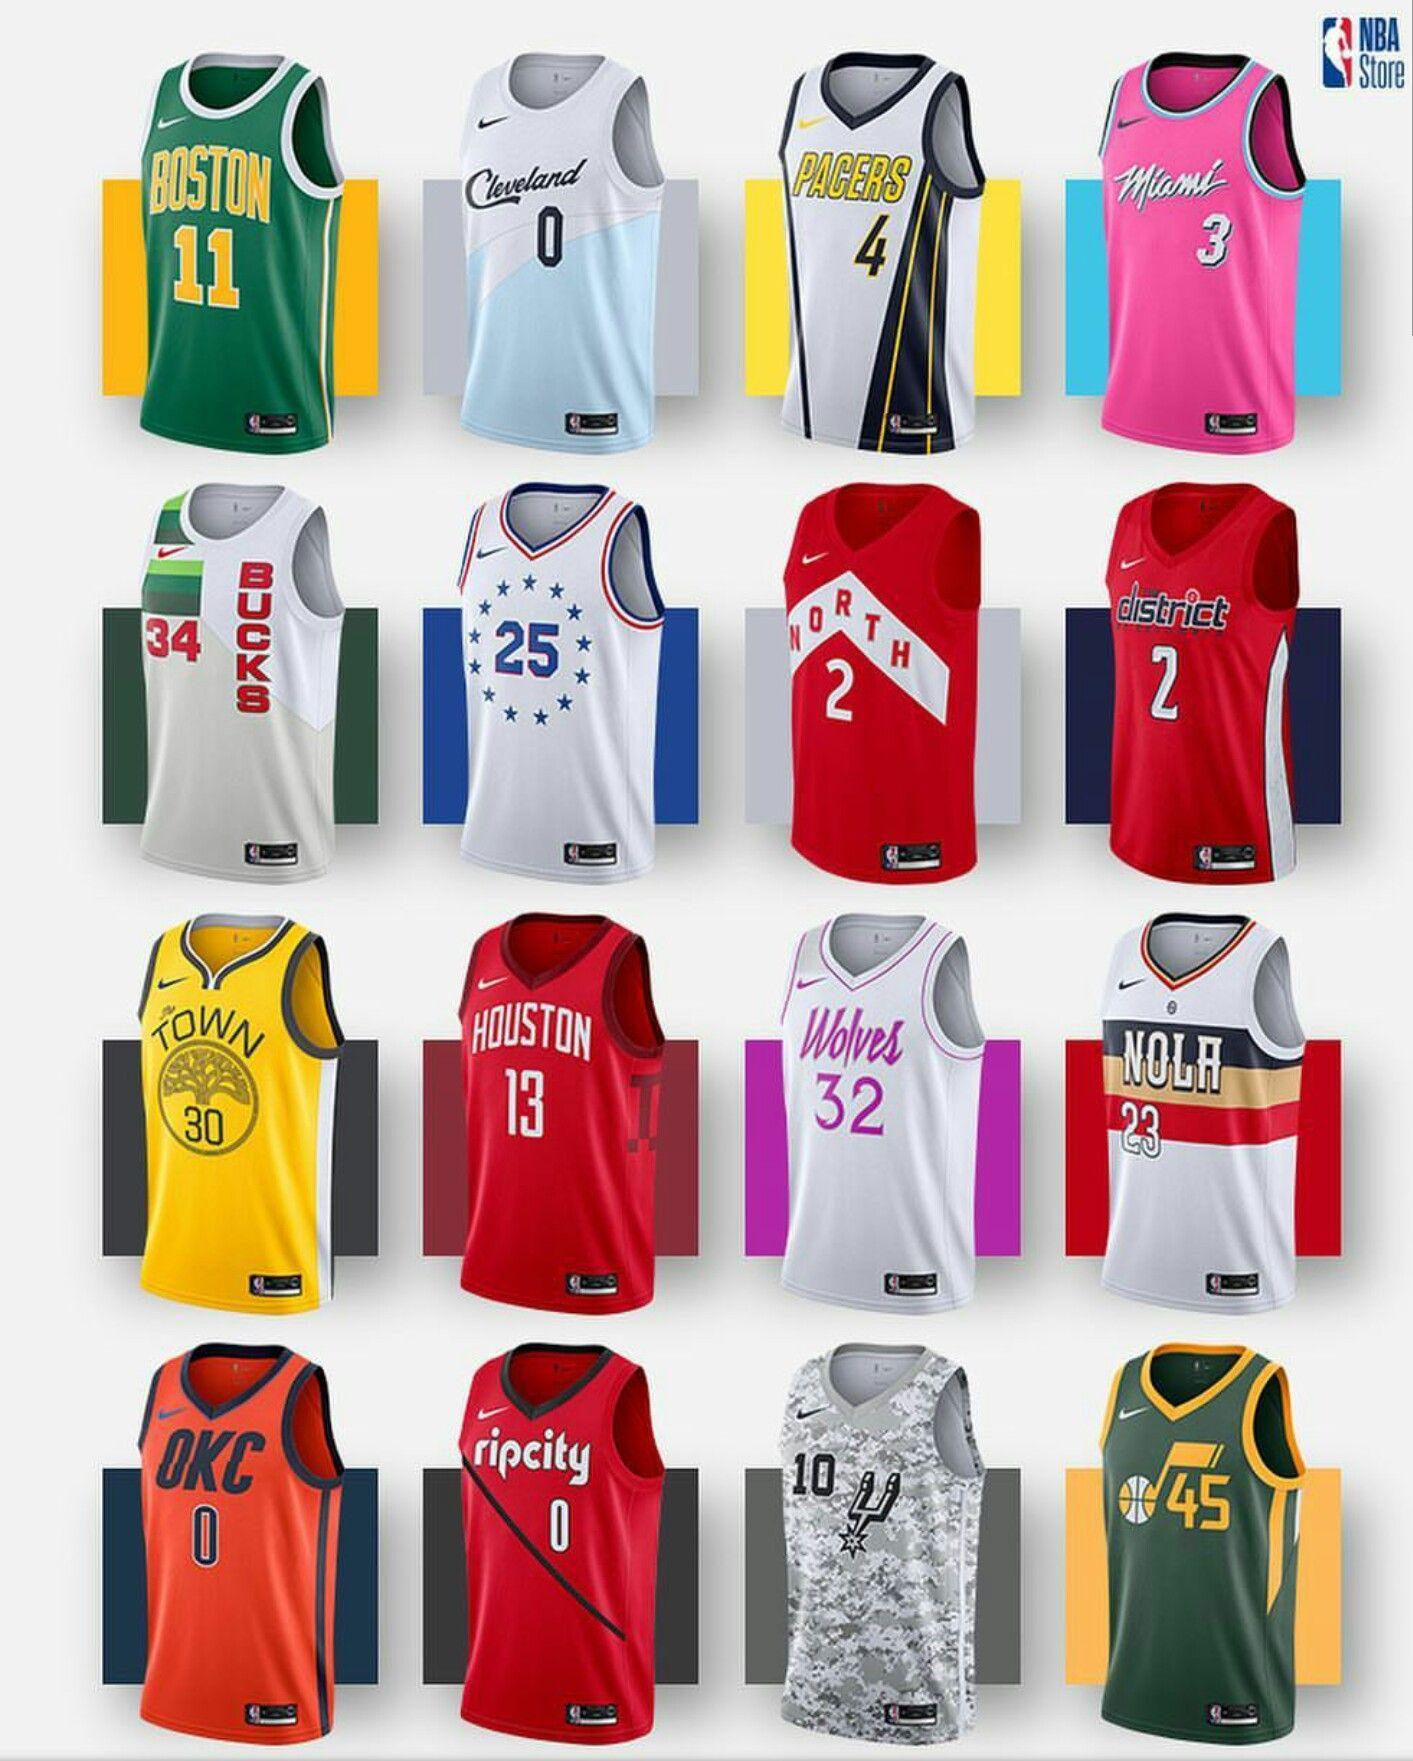 Pin By Enticing On Nba It S Fan U Kno Nba Uniforms Basketball Design Nba Jersey